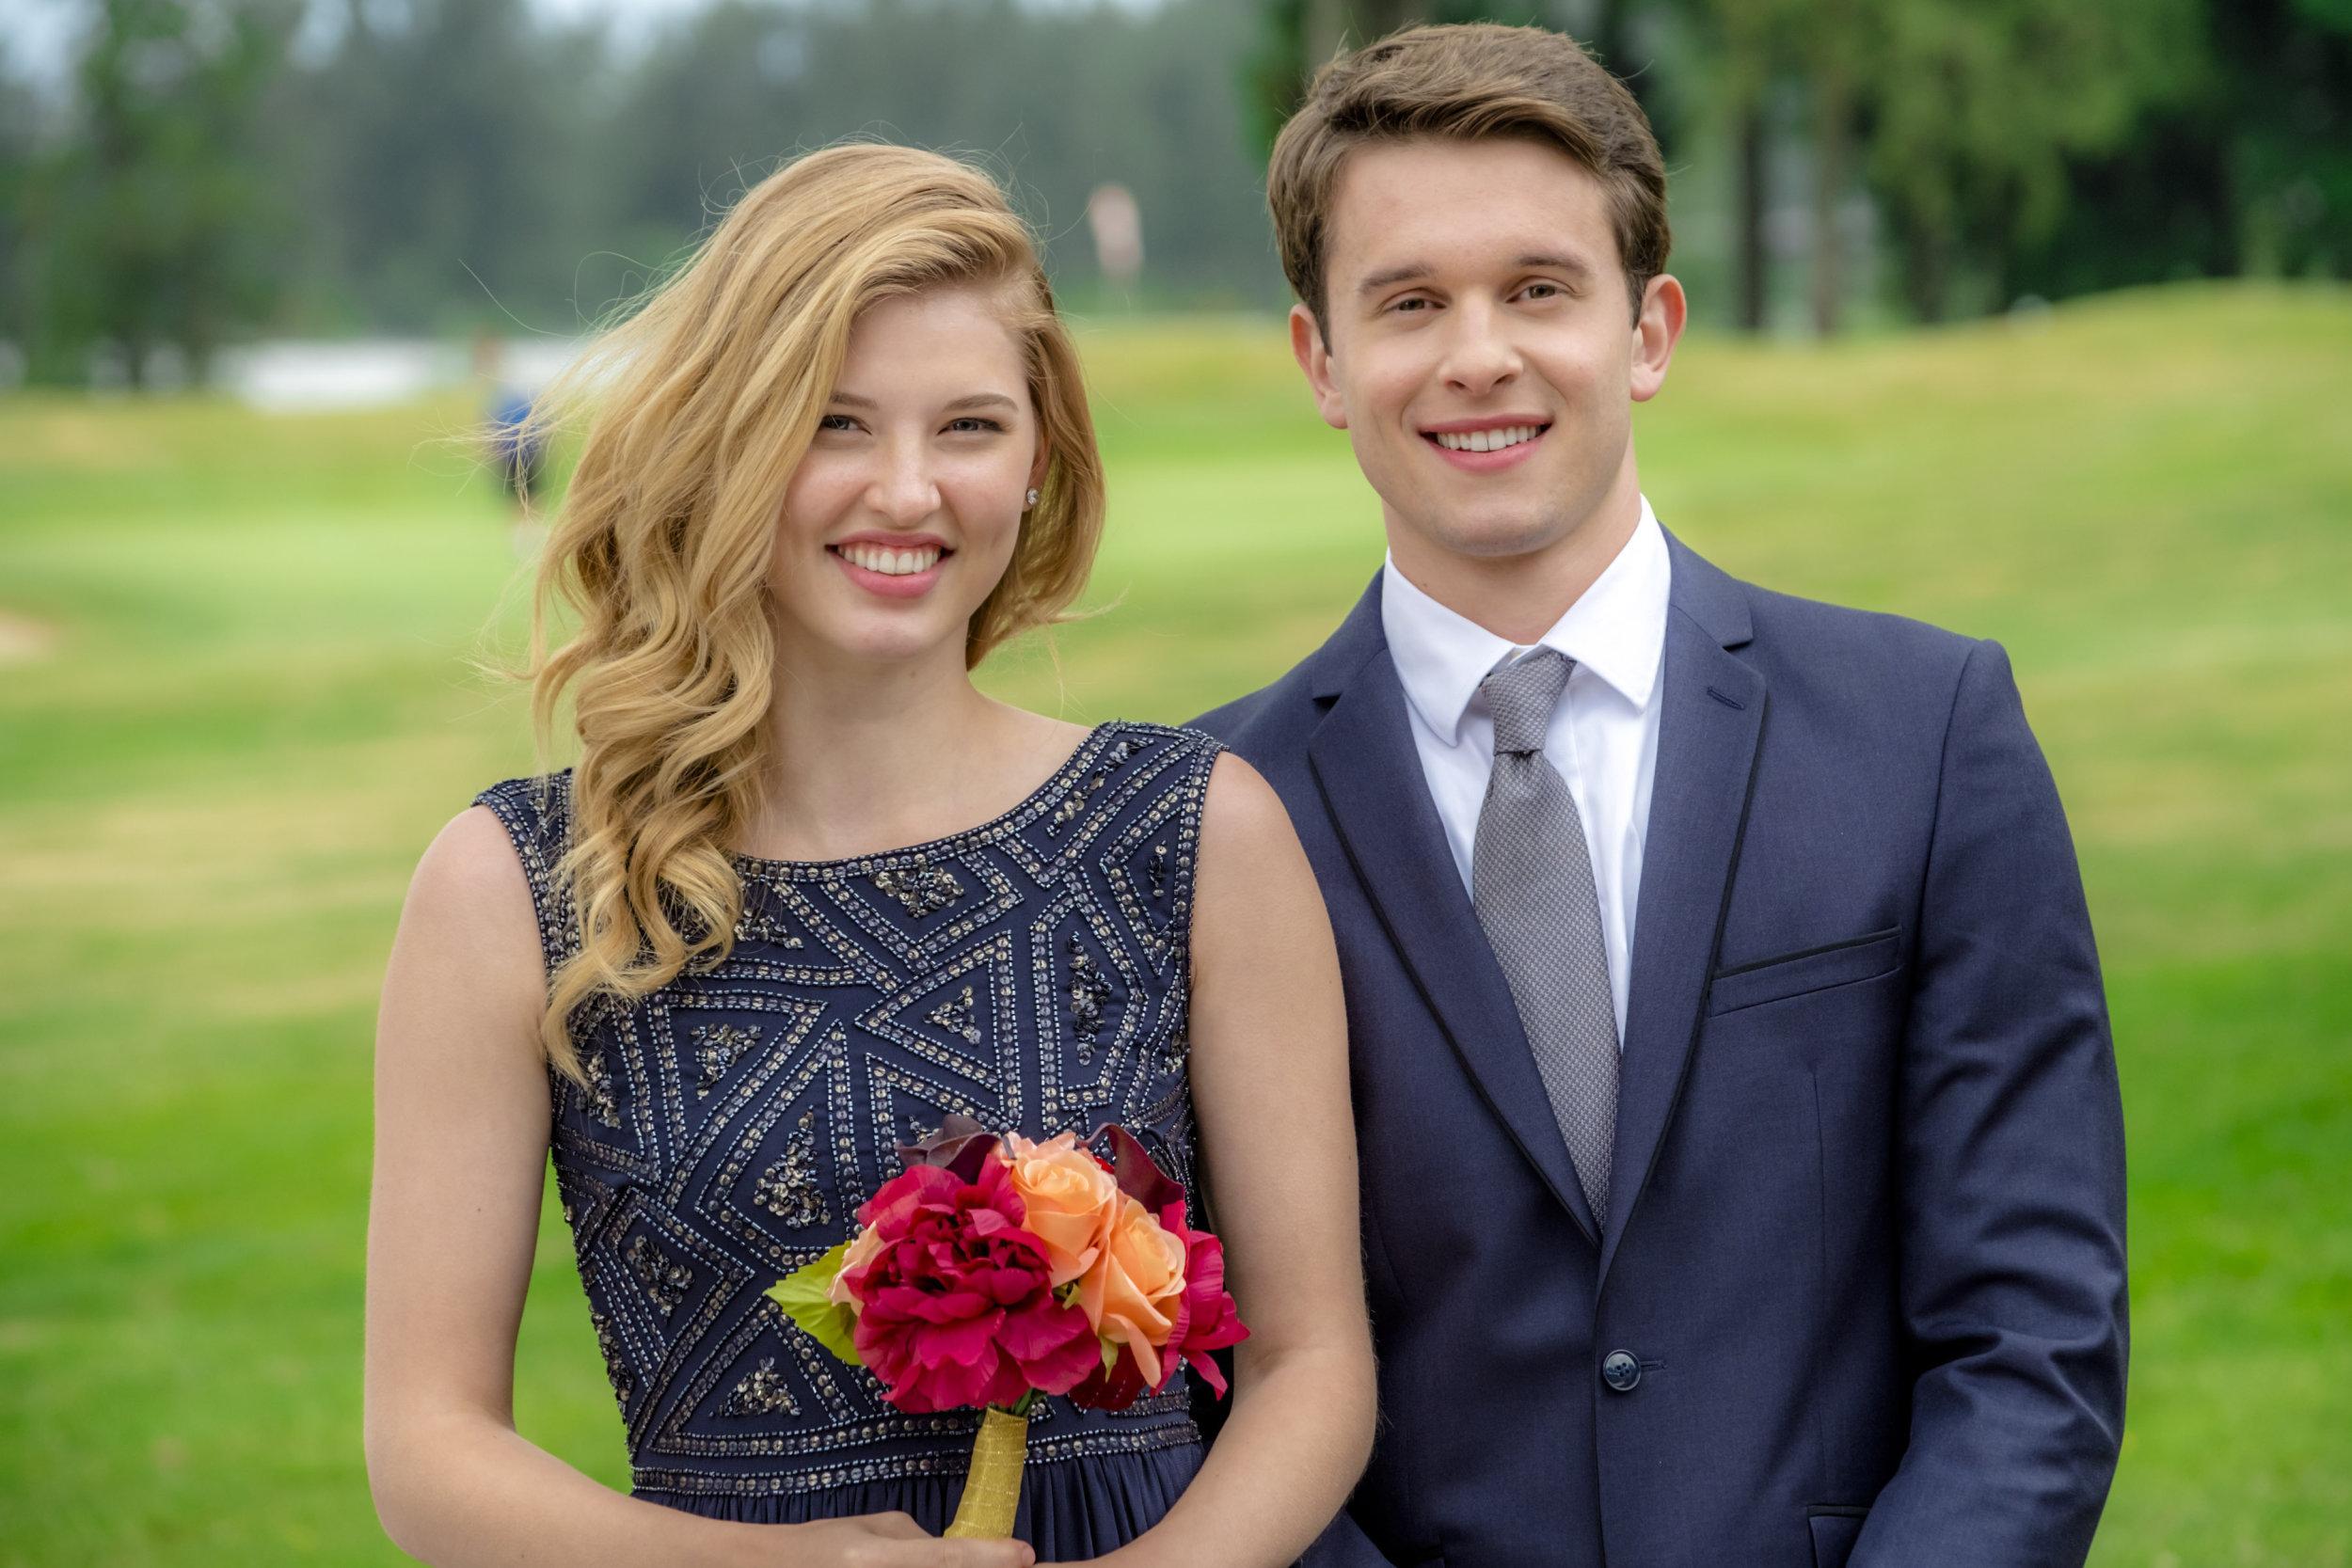 Wedding March 3.Wedding March 3 Here Comes The Bride Video Hallmark Channel